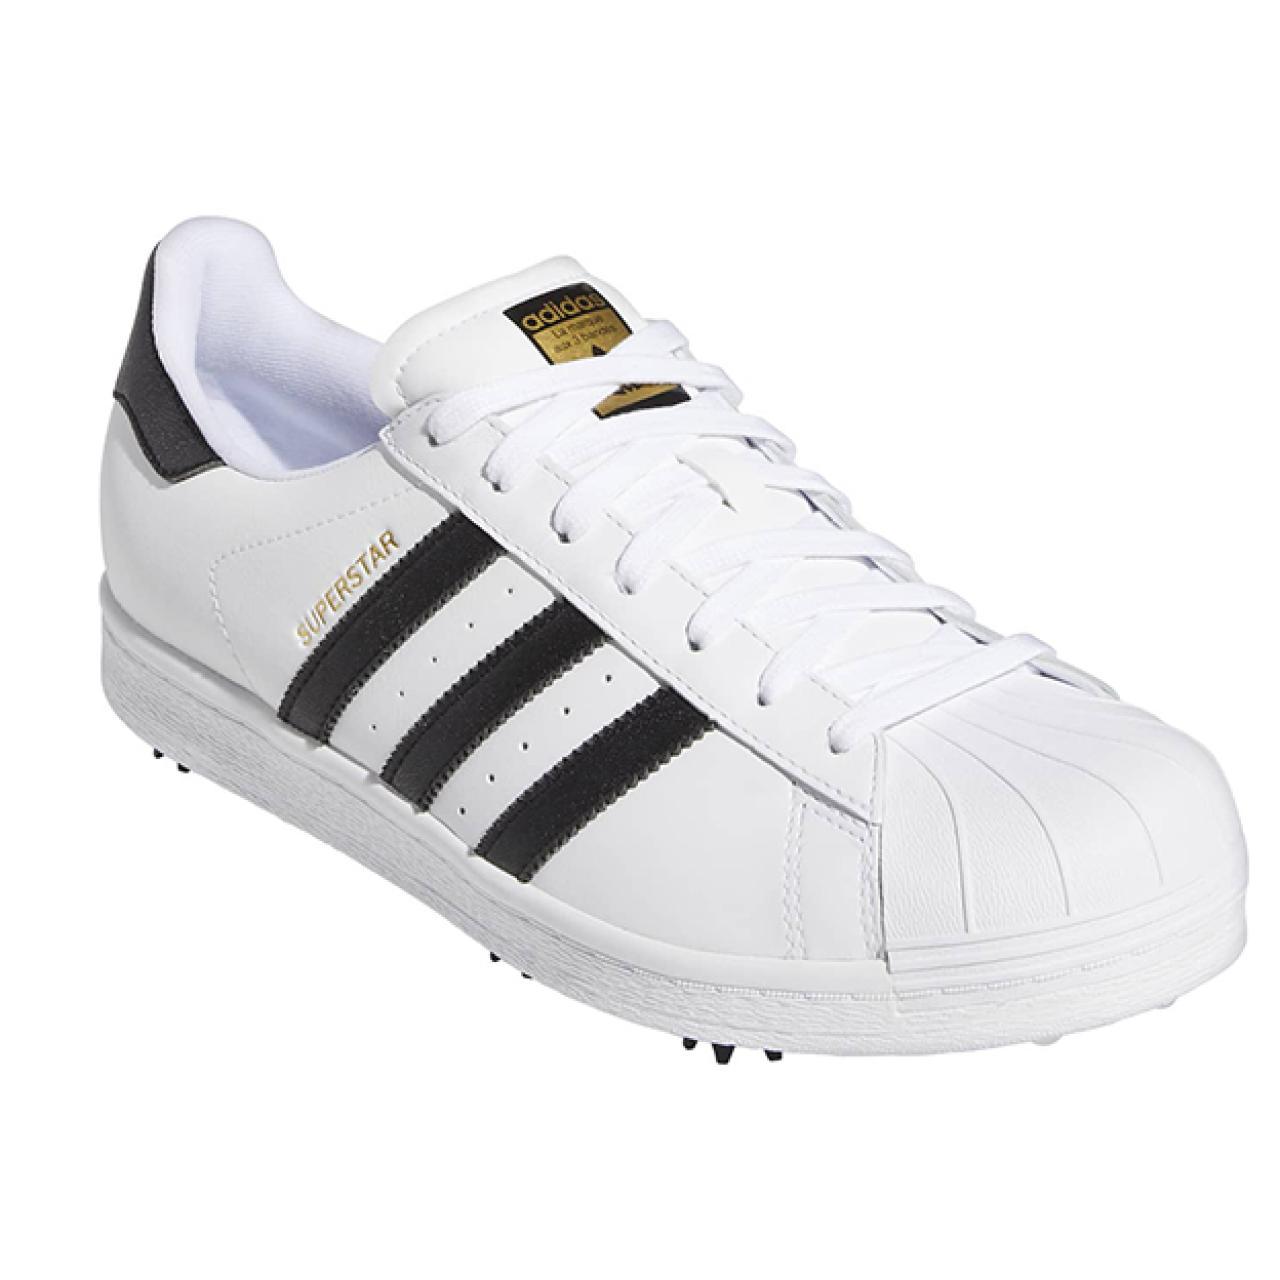 Adidas has finally made a golf shoe version of the popular three ...